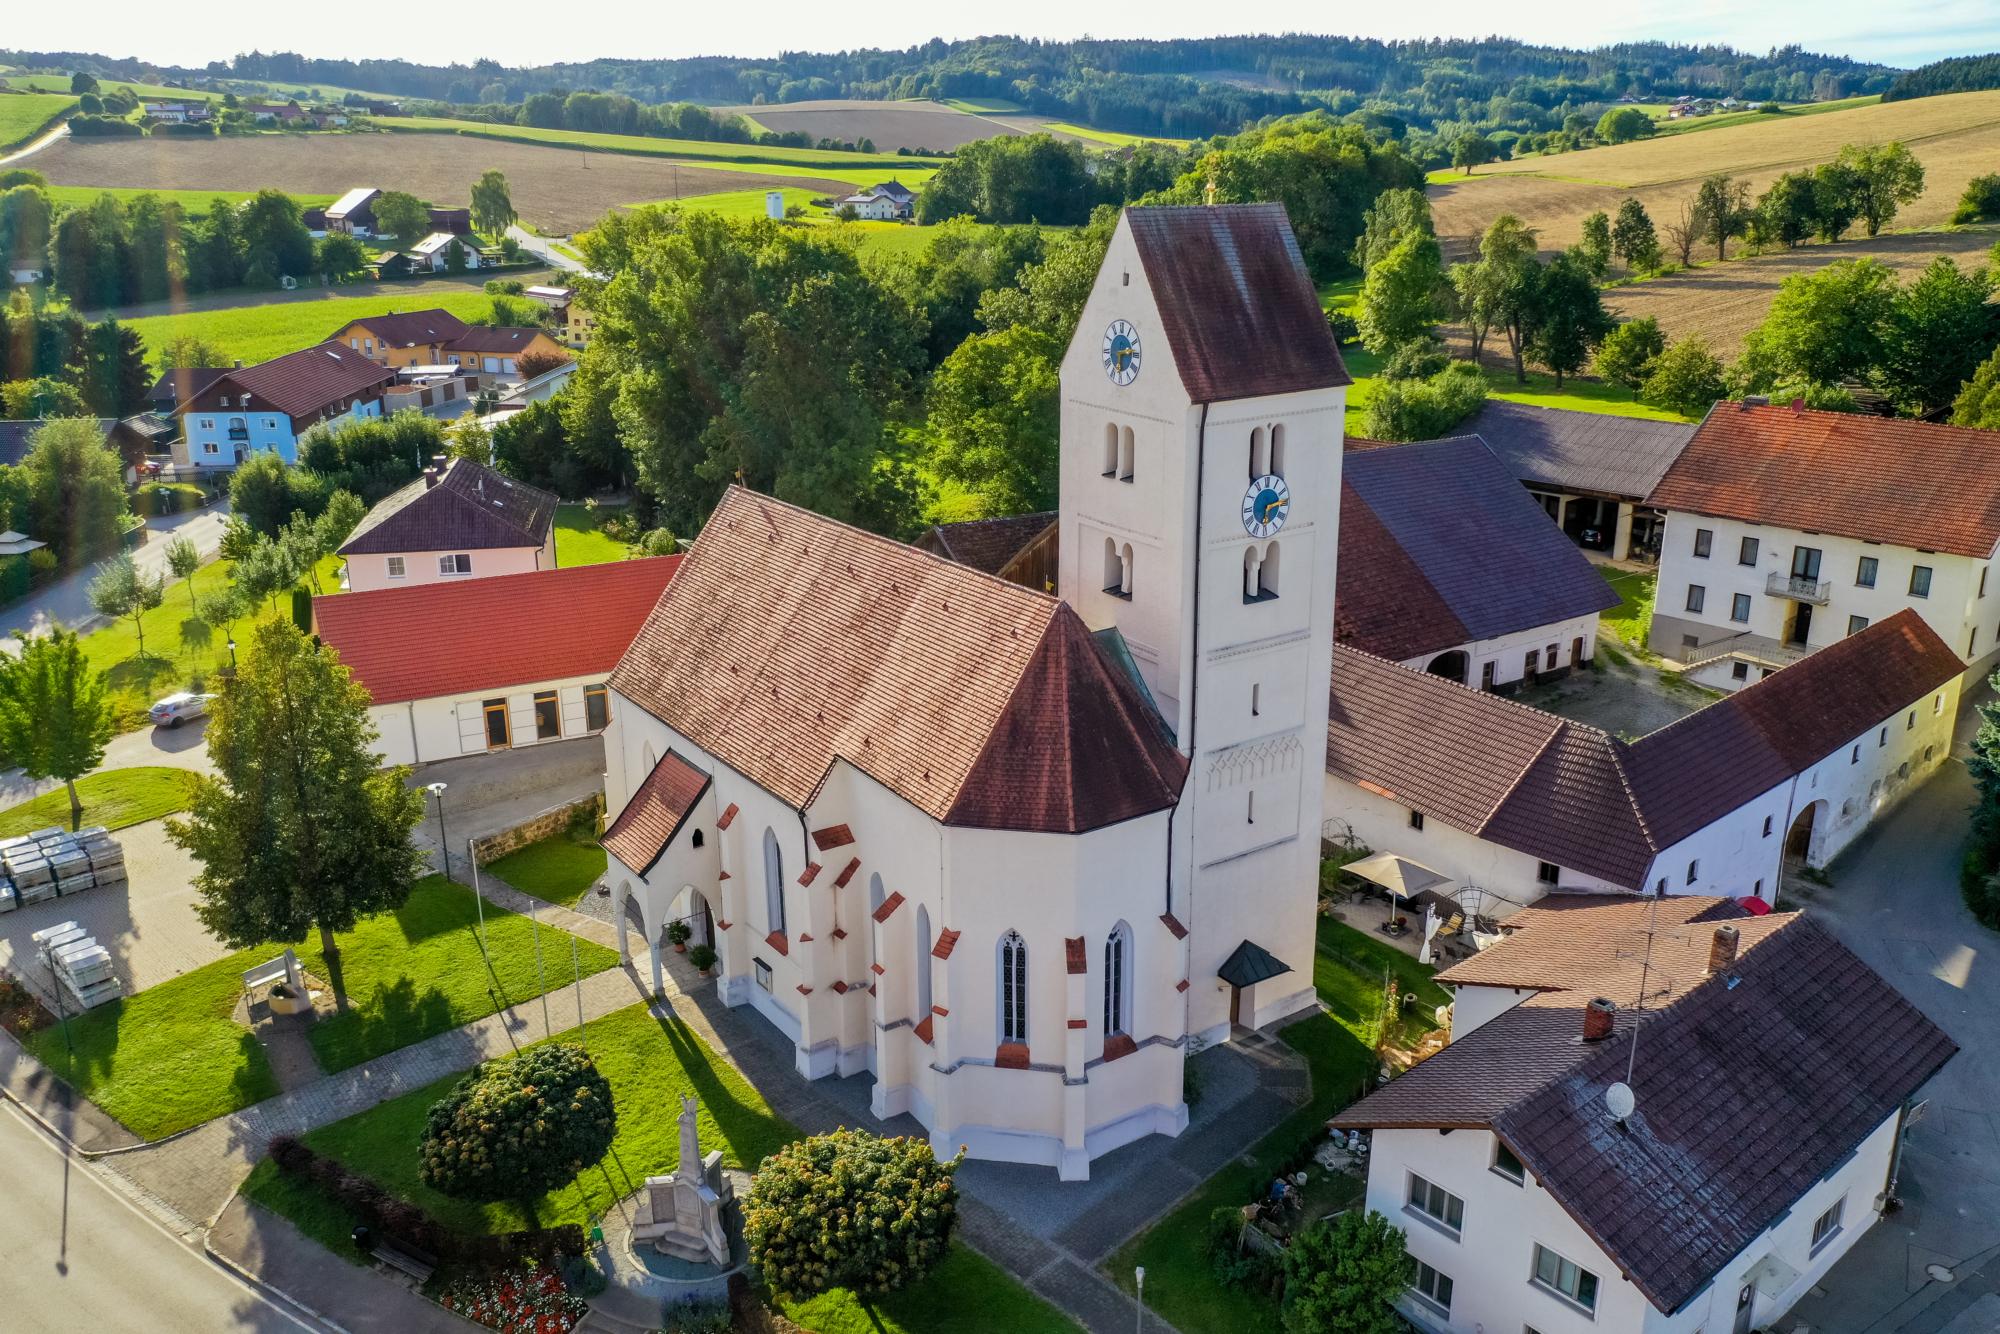 Reu Pfarrkirche